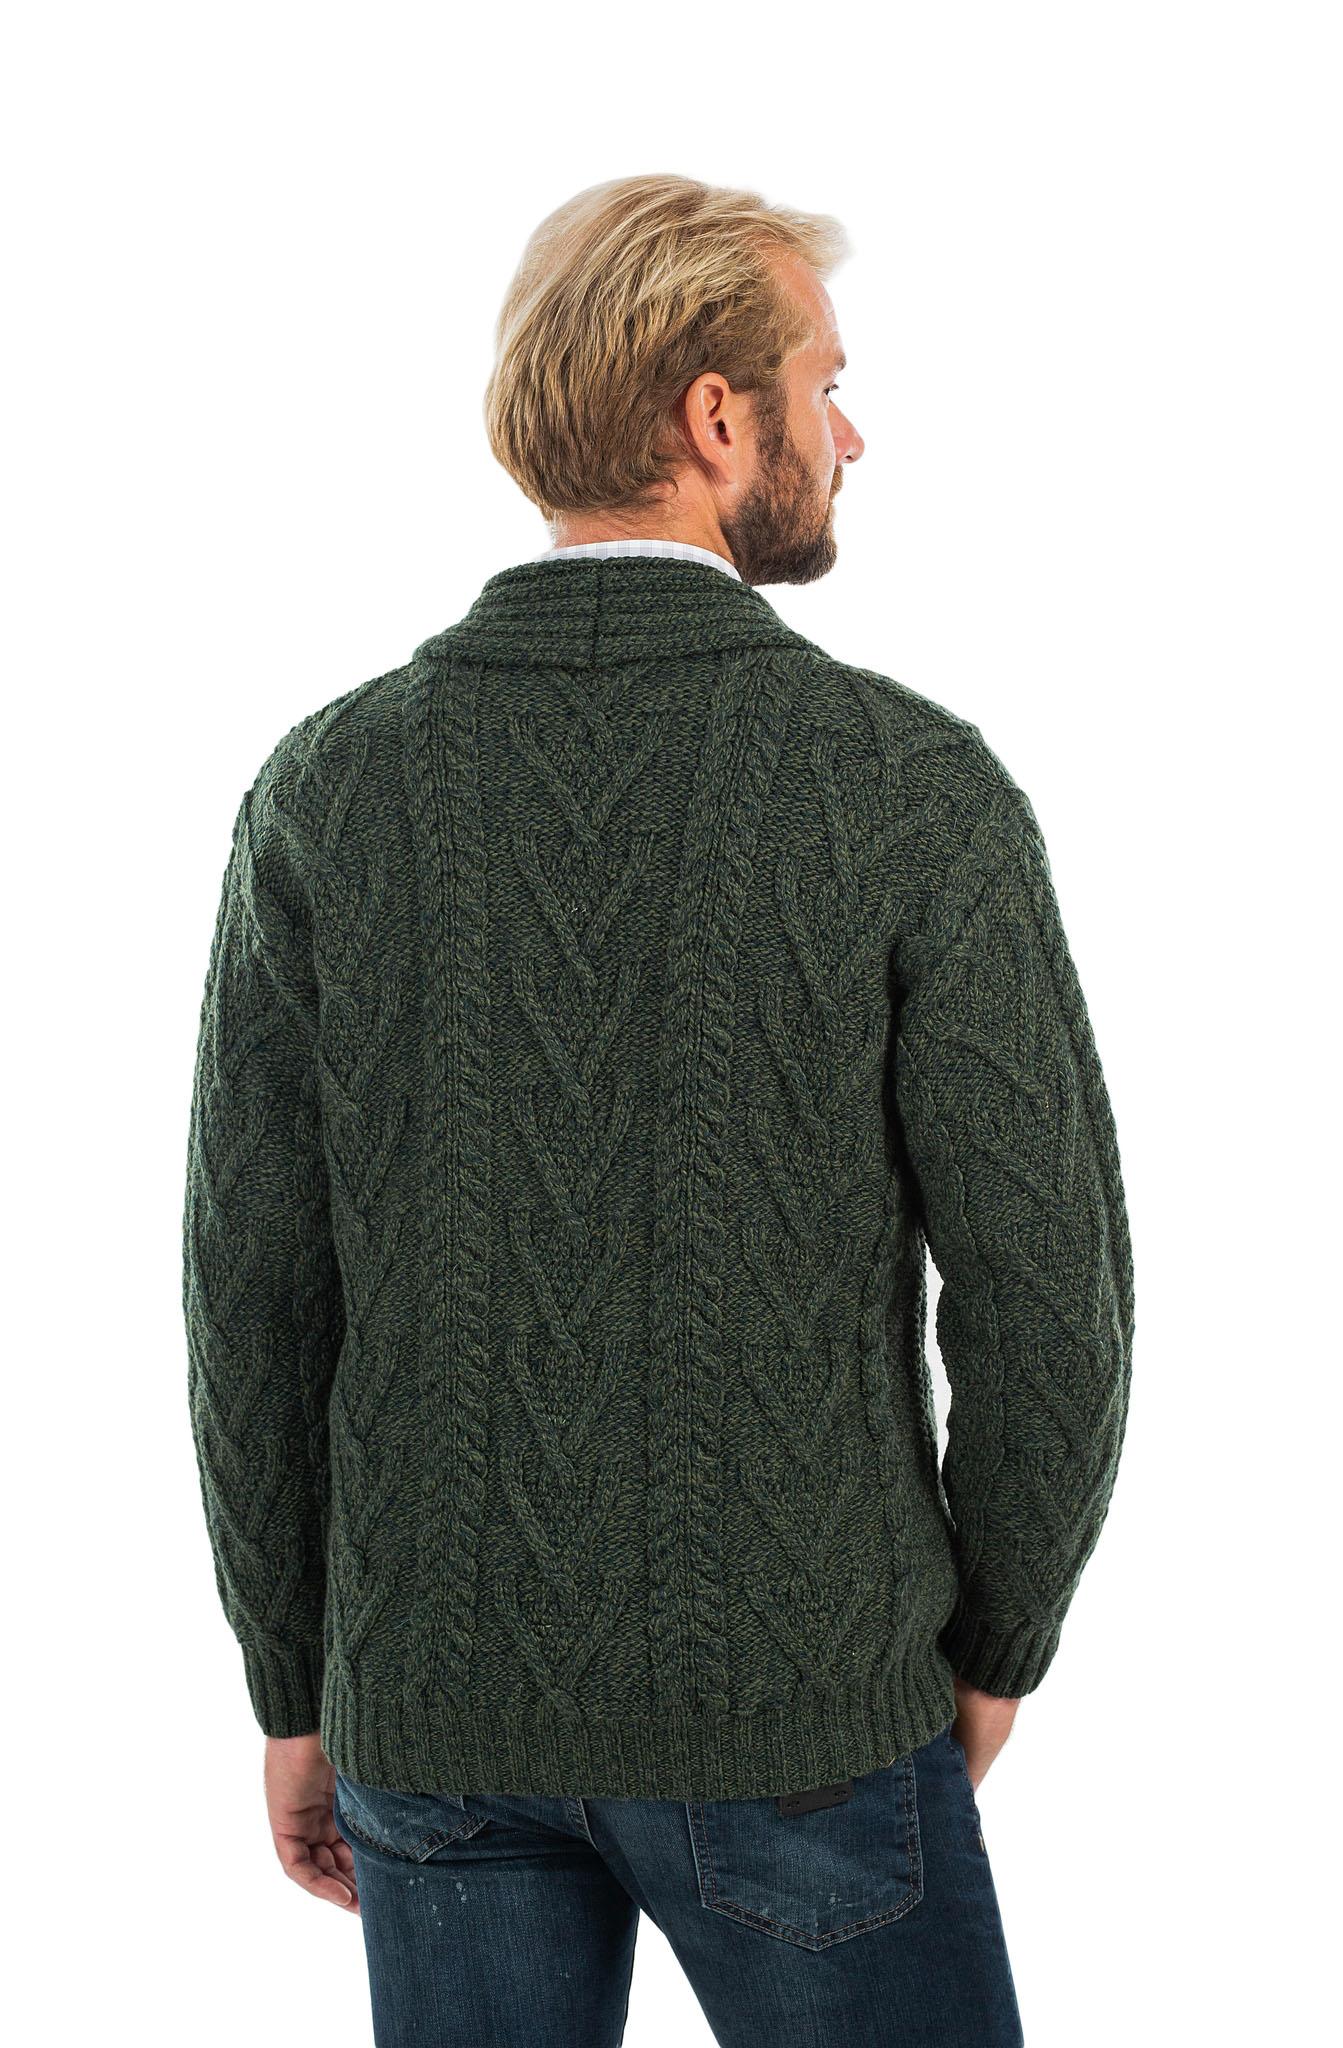 SAOL-Mens-Irish-Merino-Wool-Cardigan-Shawl-Collar-Front-Pockets-Aran-Cable-Knit thumbnail 15